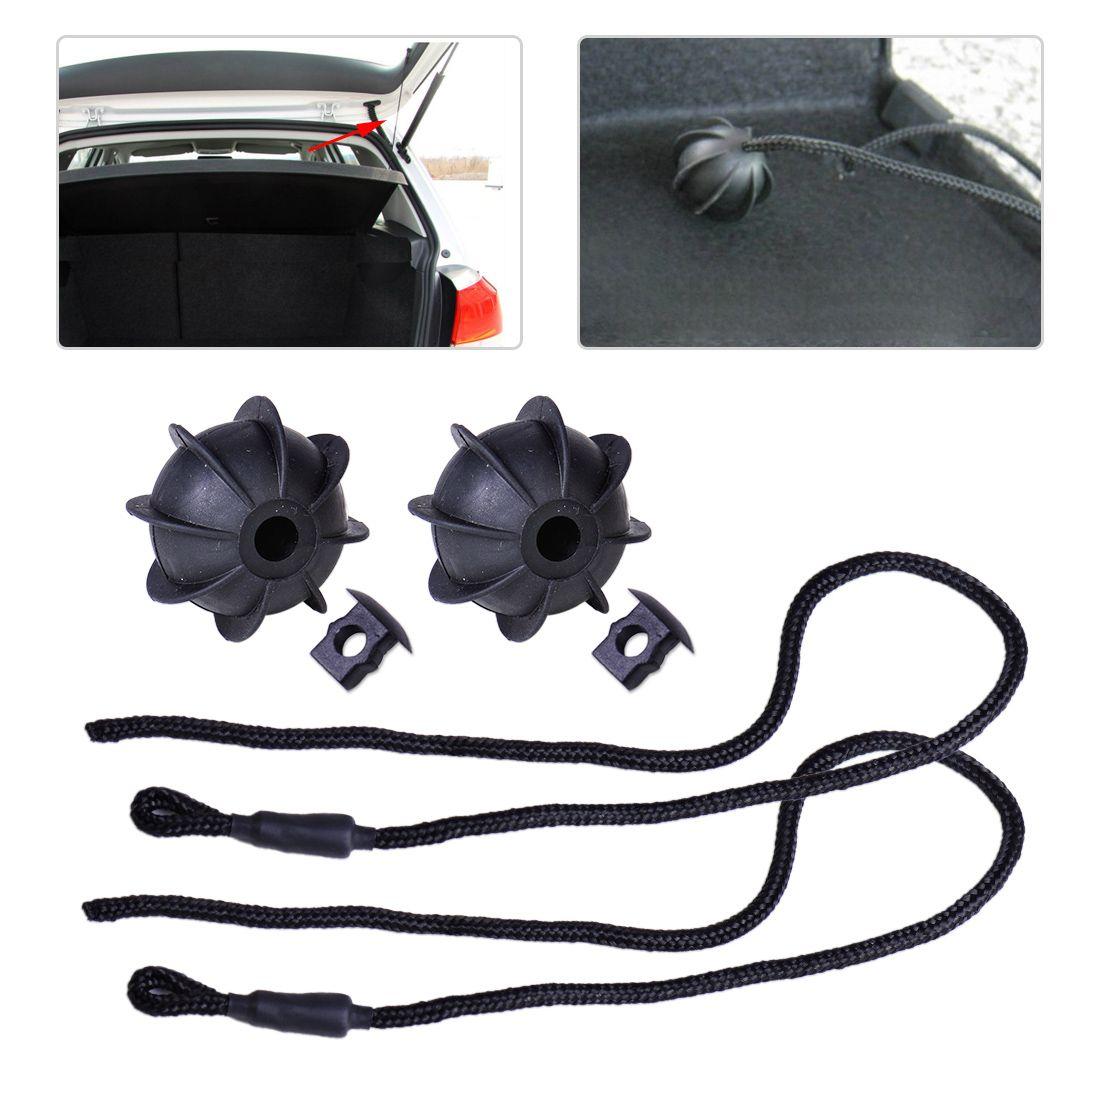 beler 2pcs Black Interior Rear Parcel Shelf String Tonneau Cover Strap Cord 1K6863447A 1K6863447A9B9 fit for VW Golf GTI Rabbit